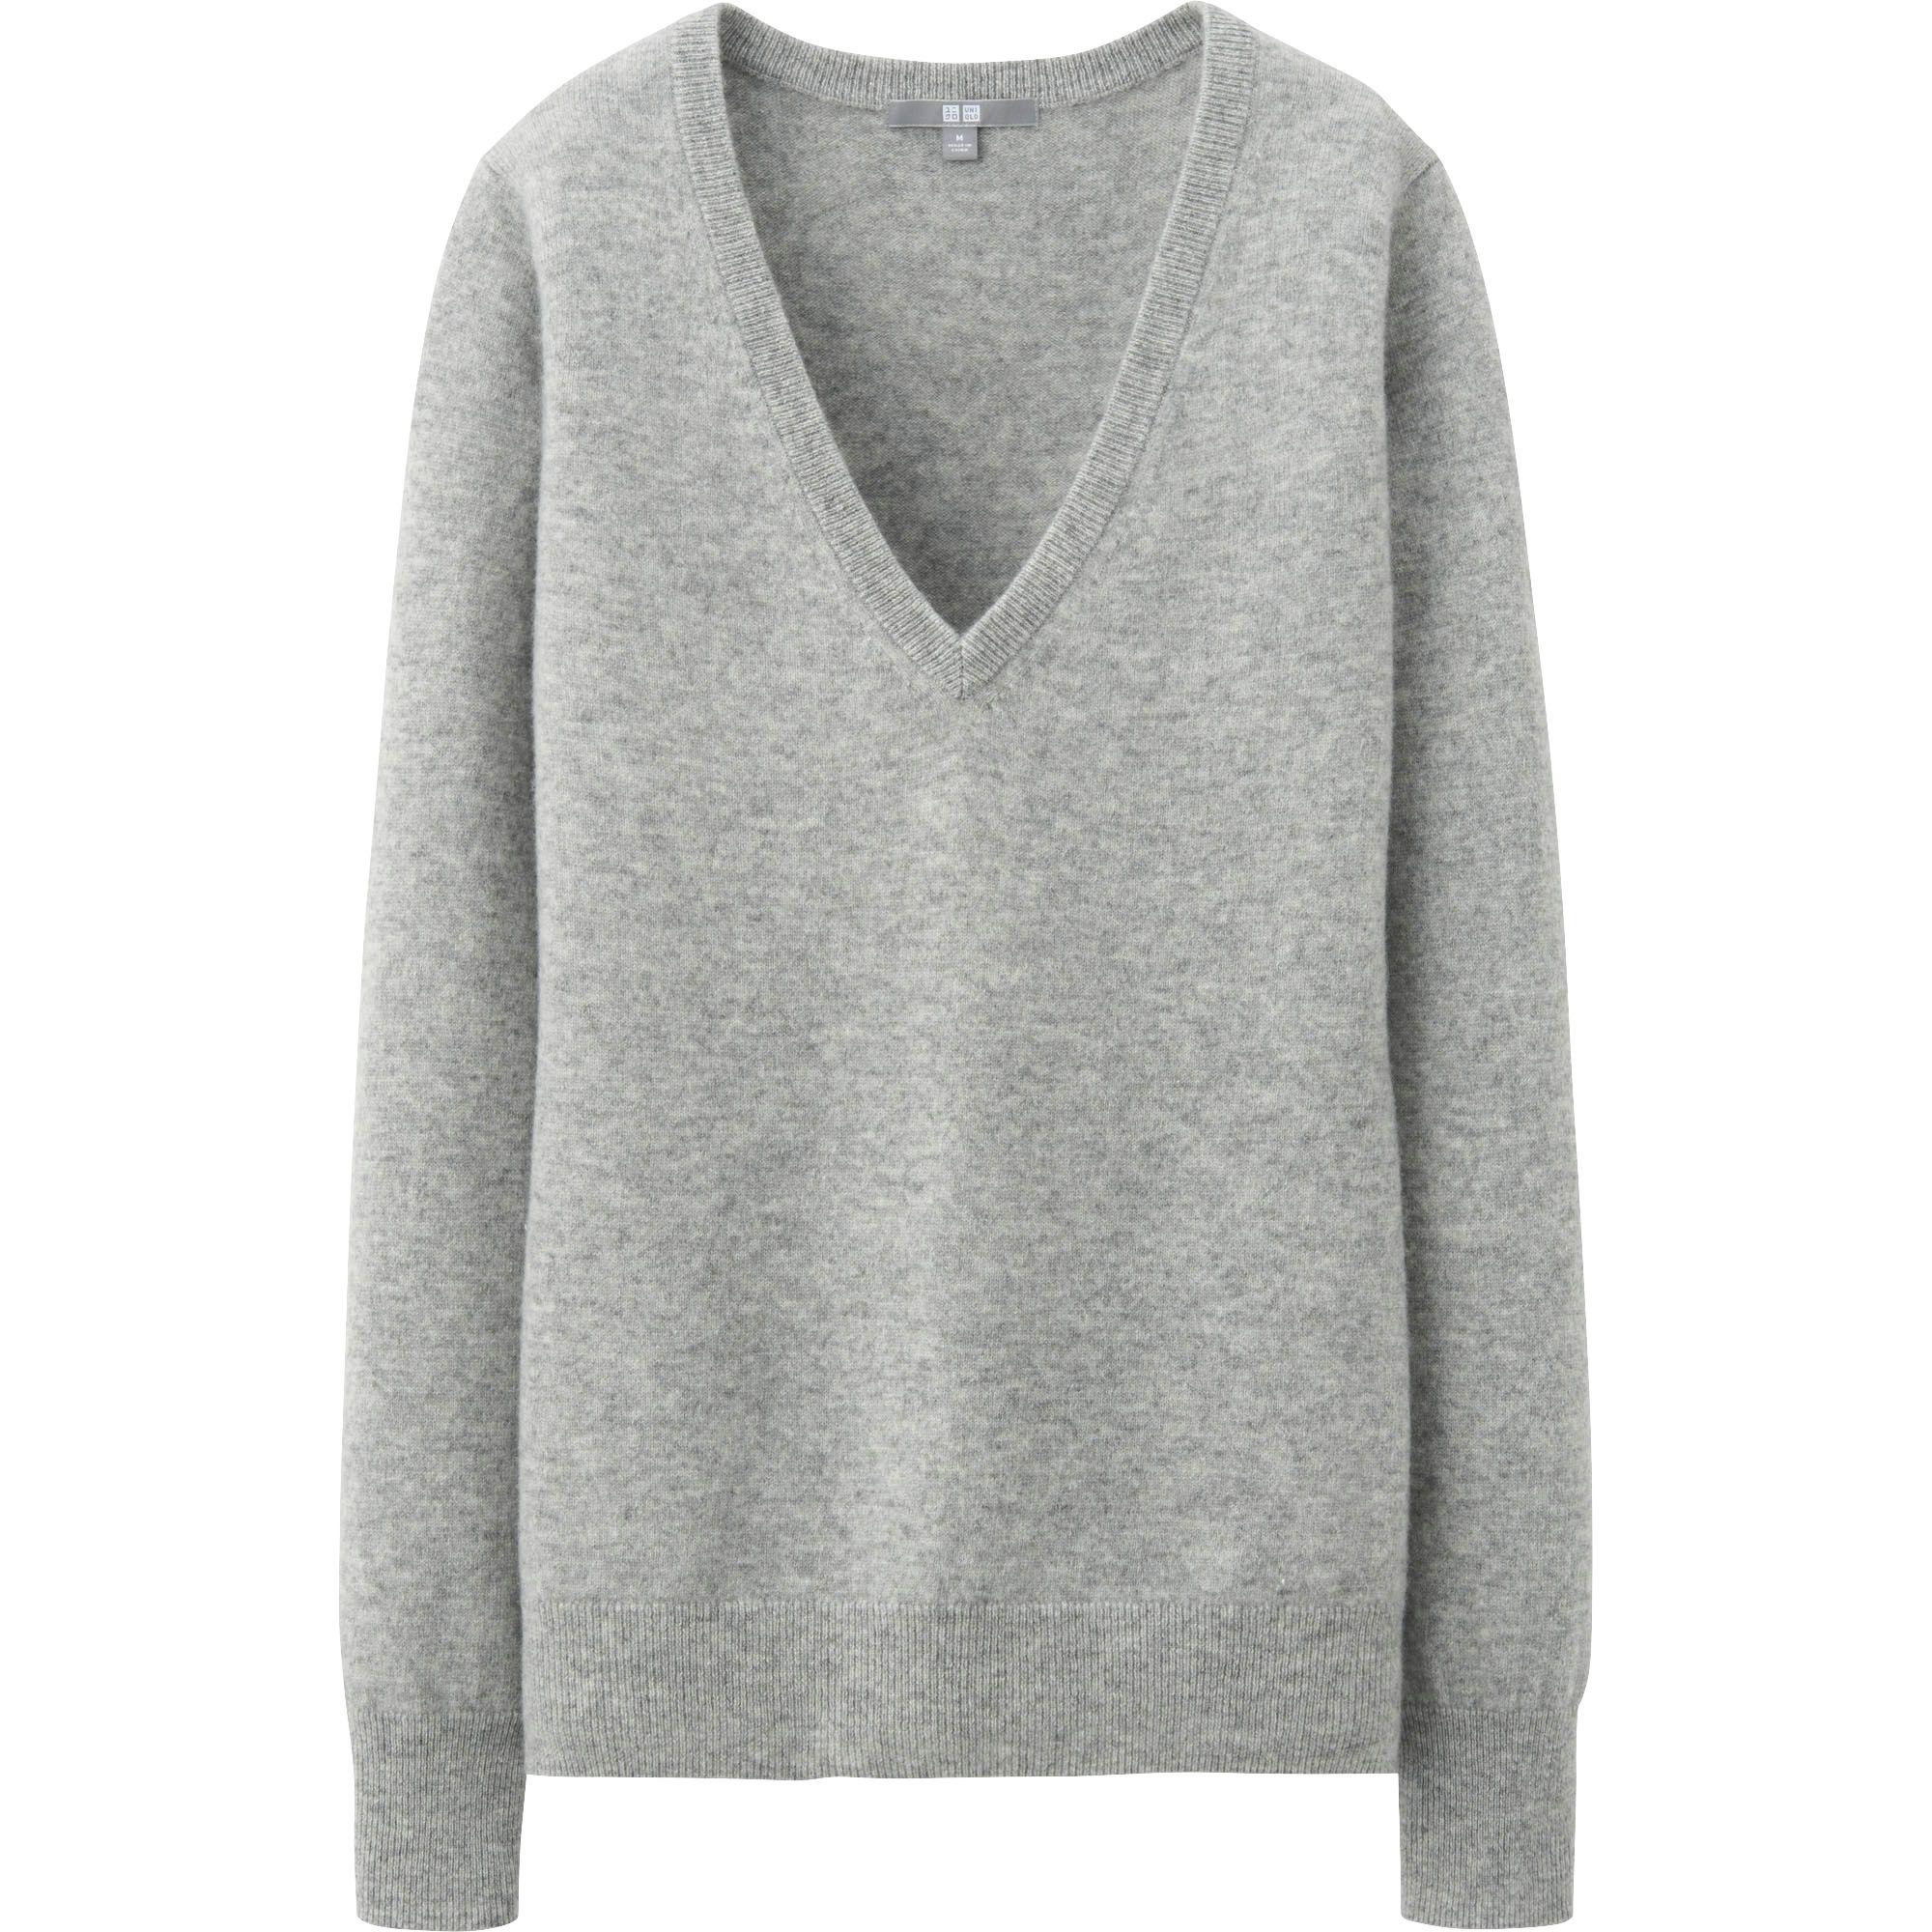 Kohls Womens Shirts